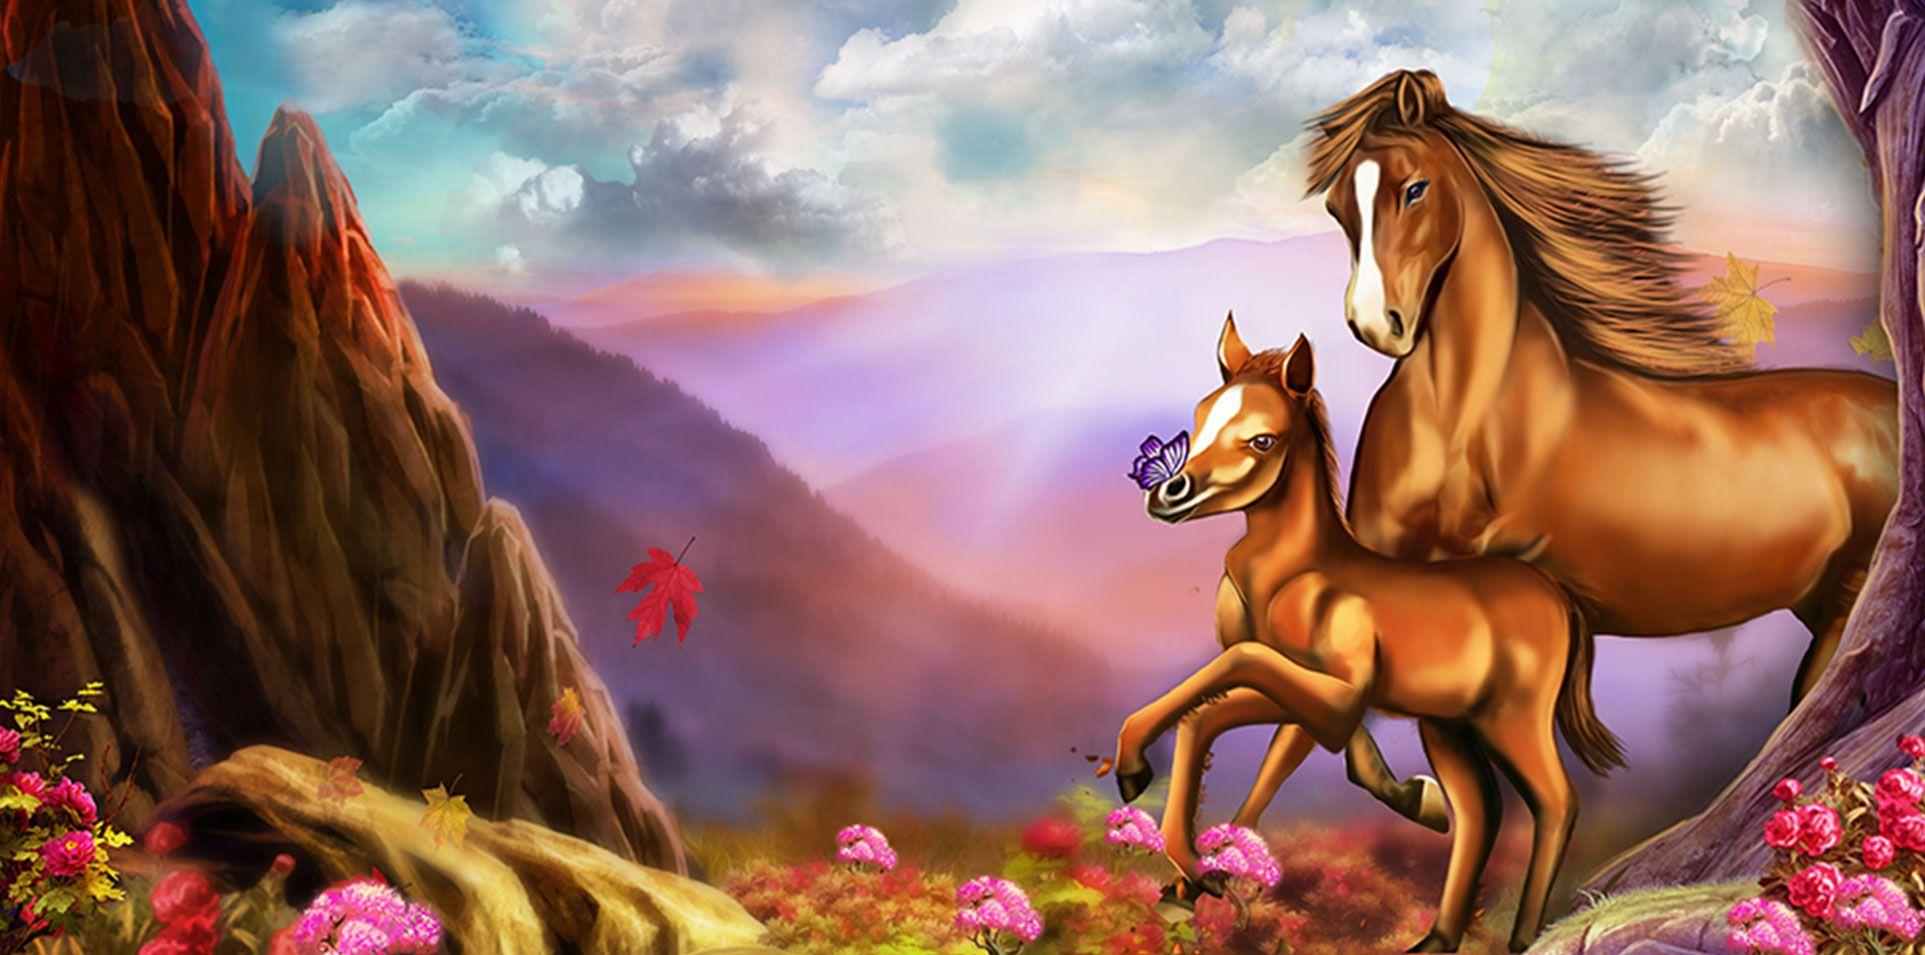 Wolf quest Virtual world games, Virtual world, Horse